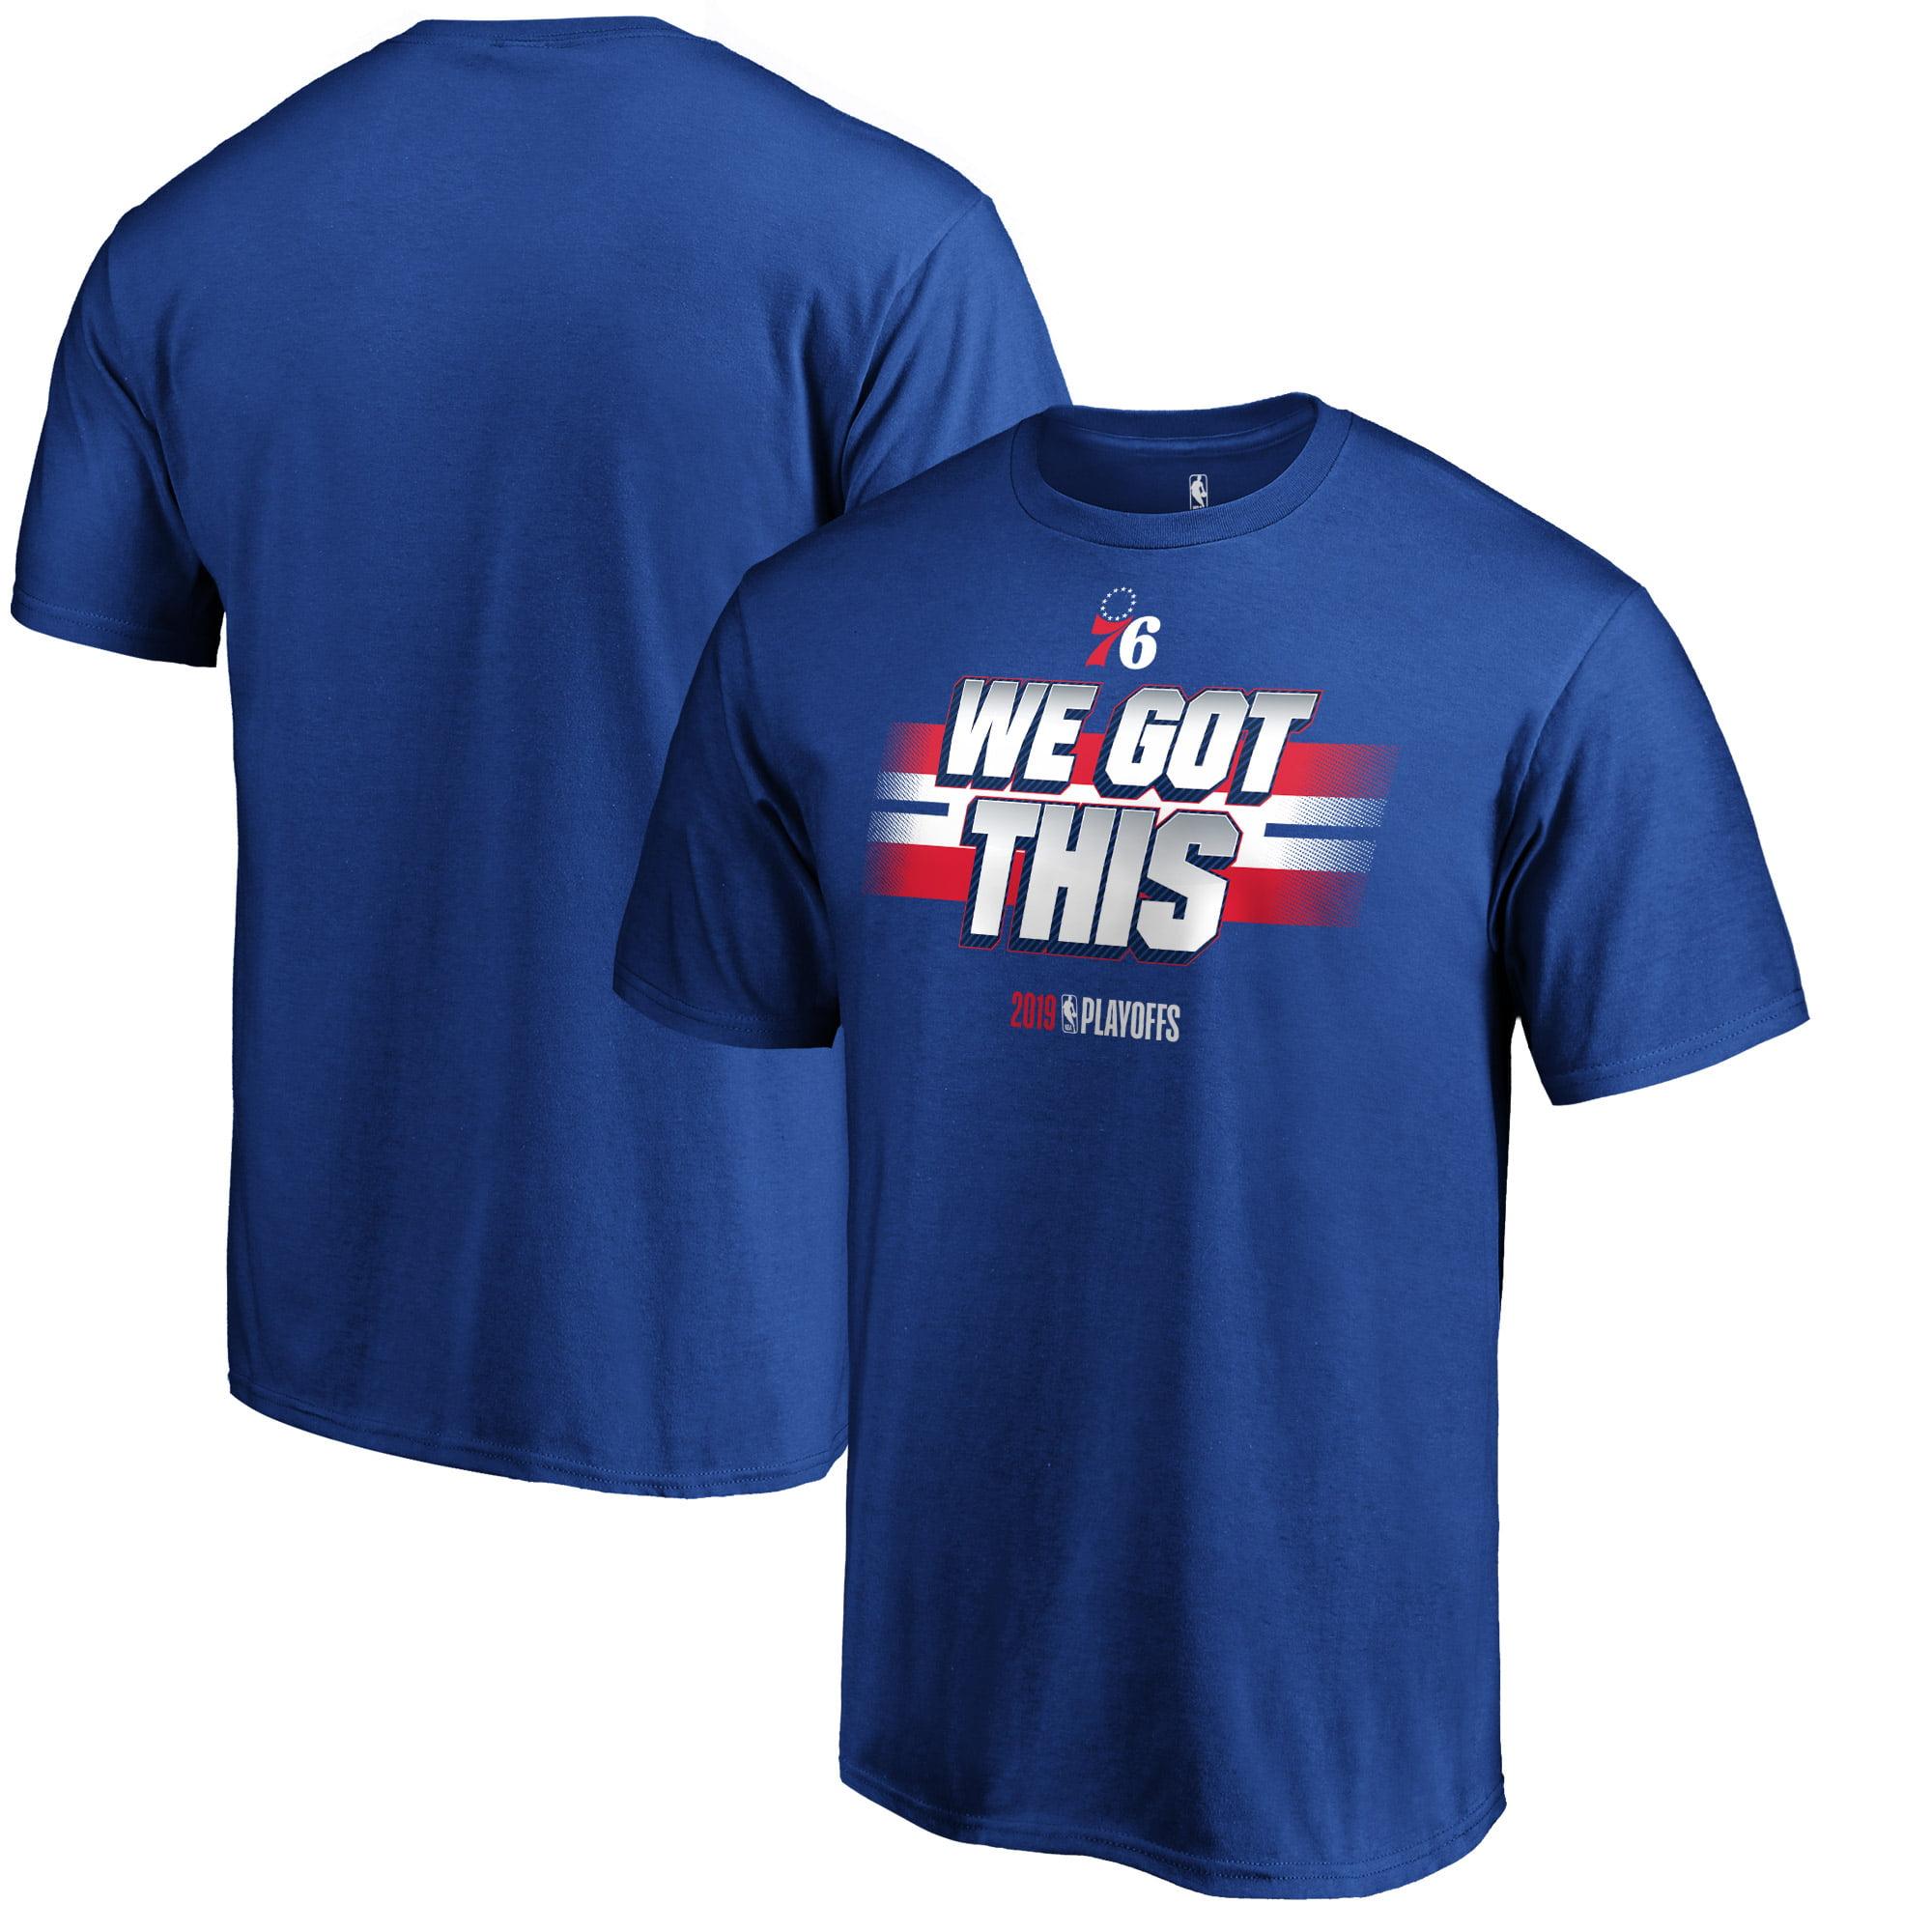 Philadelphia 76ers Fanatics Branded 2019 NBA Playoffs Bound All You Got T-Shirt - Royal